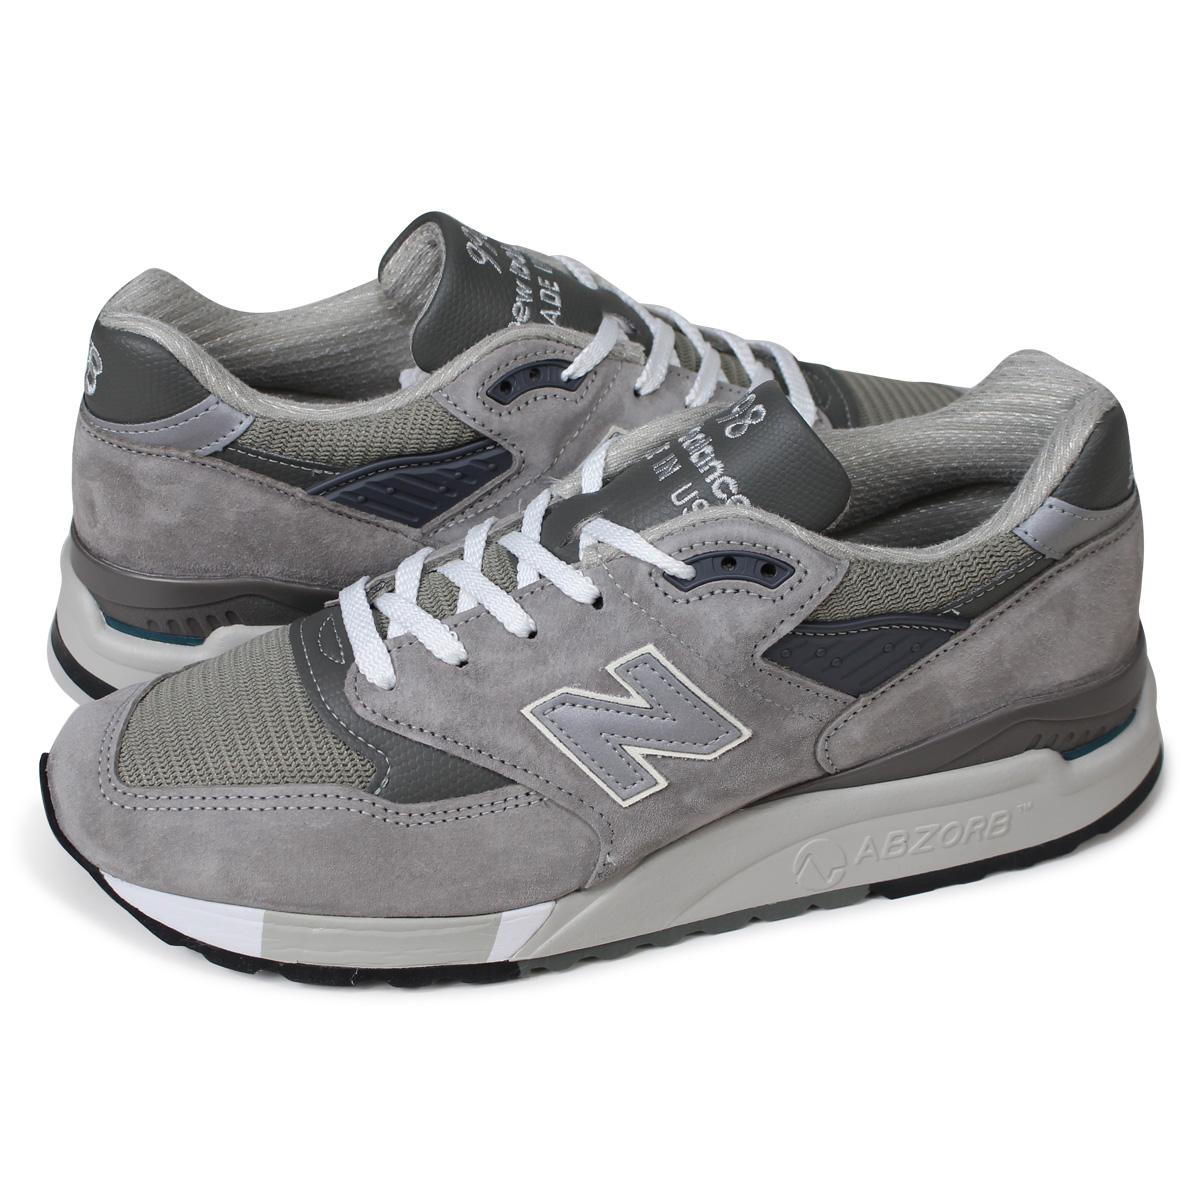 new balance M998 GY ニューバランス スニーカー MADE IN USA Dワイズ メンズ 靴 グレー